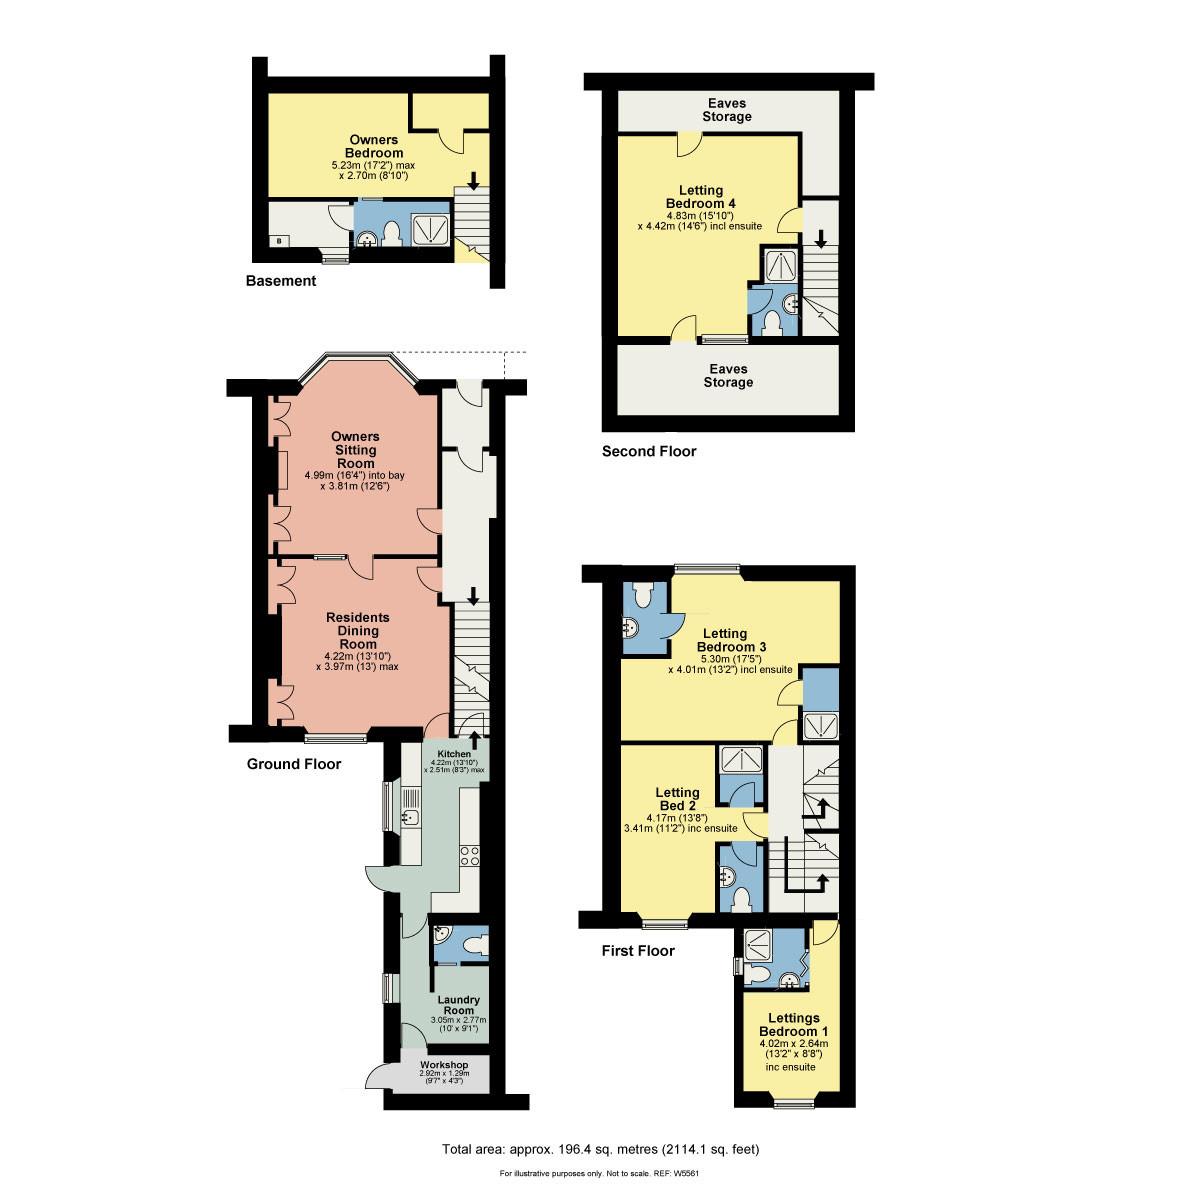 Floorplan Beech House, 11 Woodland Road, Windermere, Cumbria, LA23 2AE